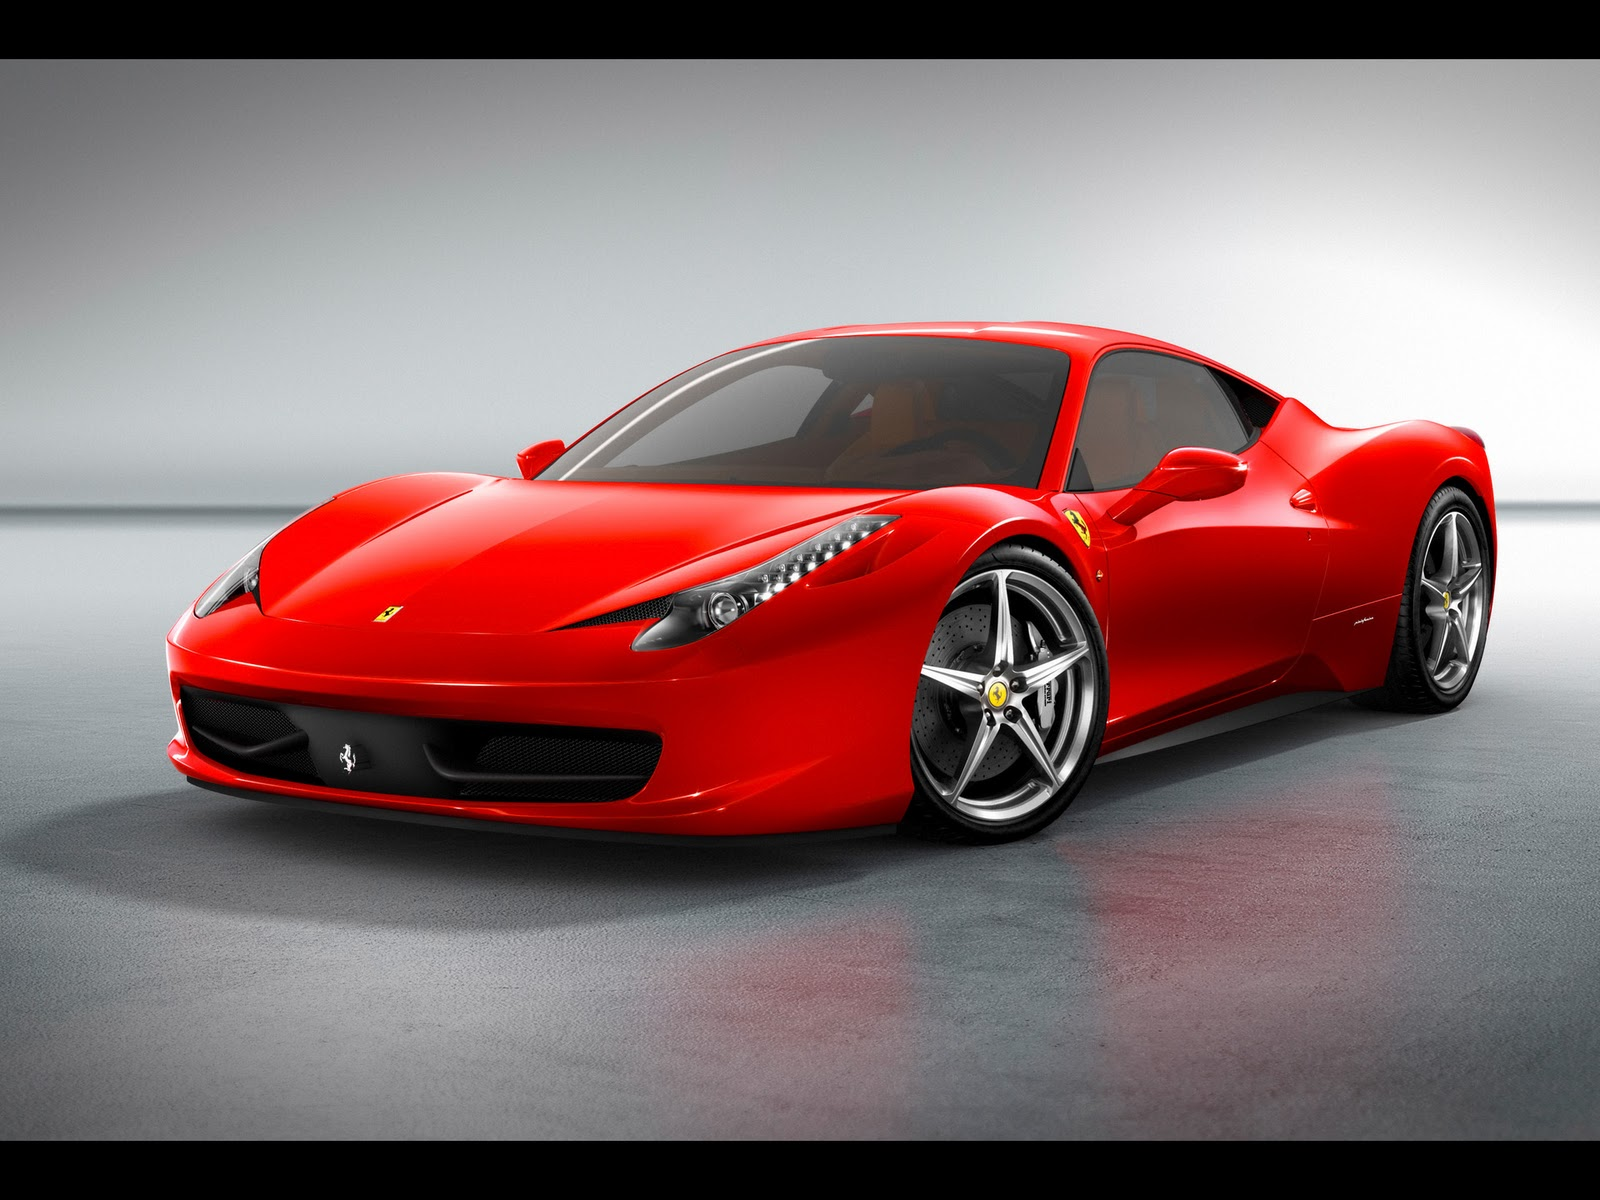 2010 Ferrari 458 Italia Side Angle 1920x1440 Wallpapers Of Cars Hd